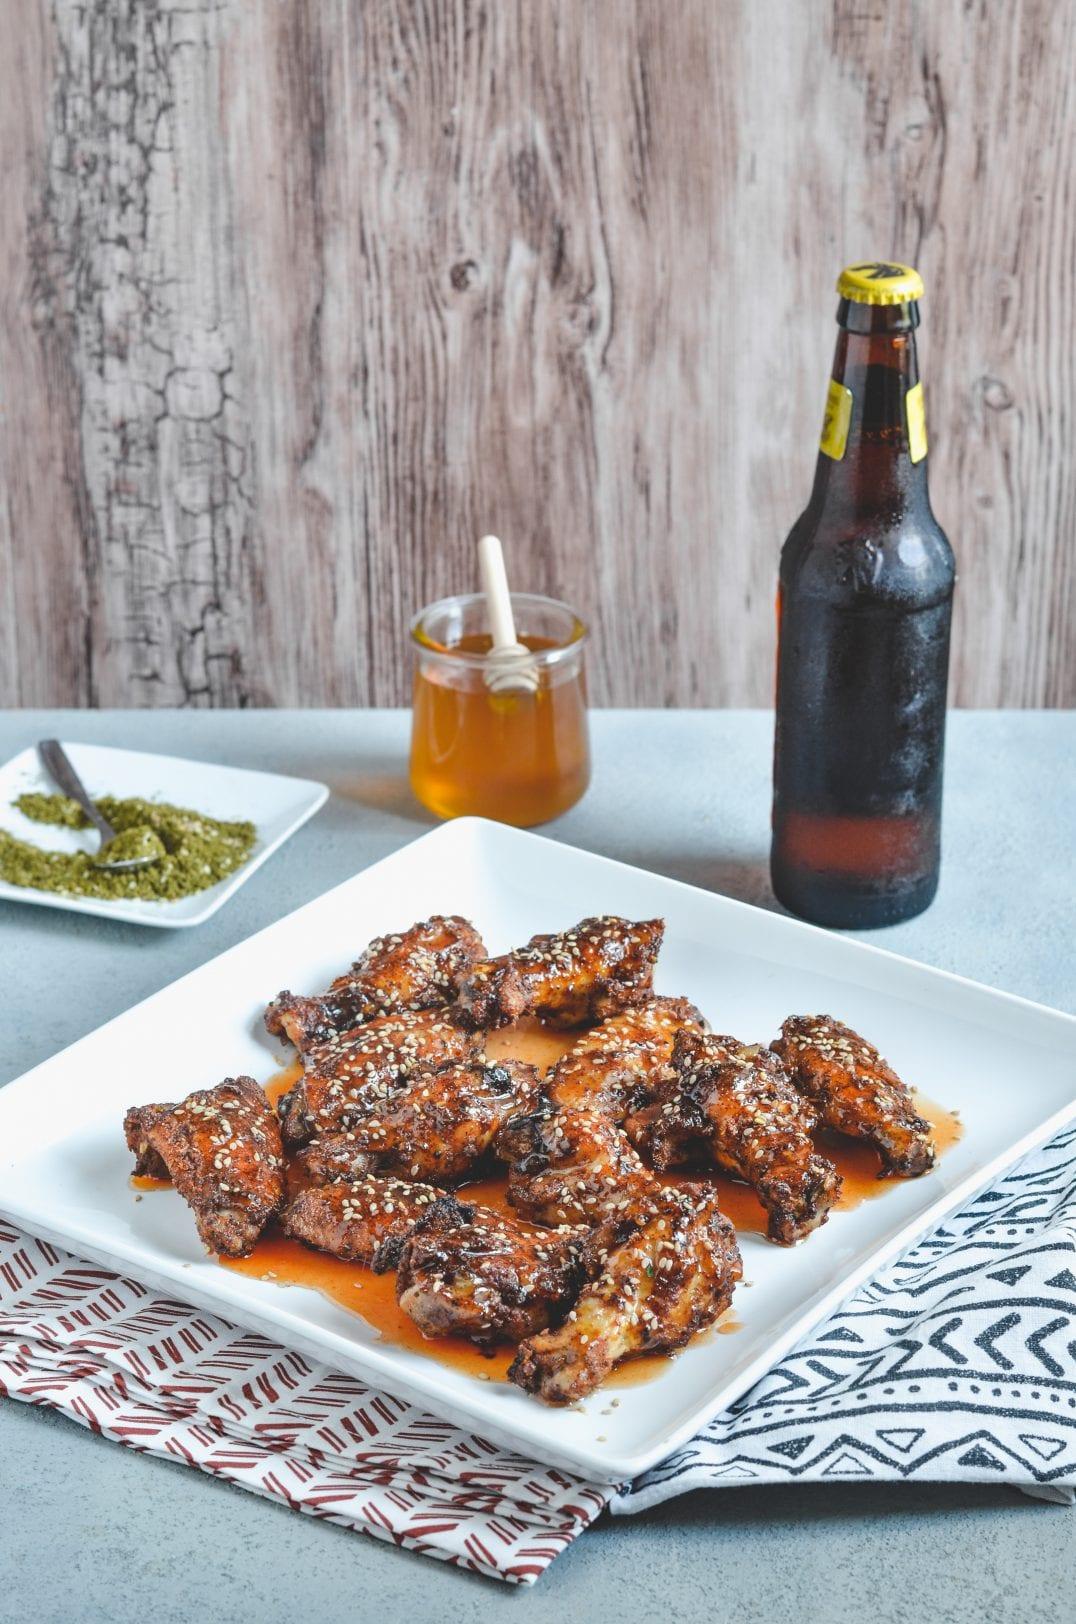 Honey Za'atar Hot Wings on a plate